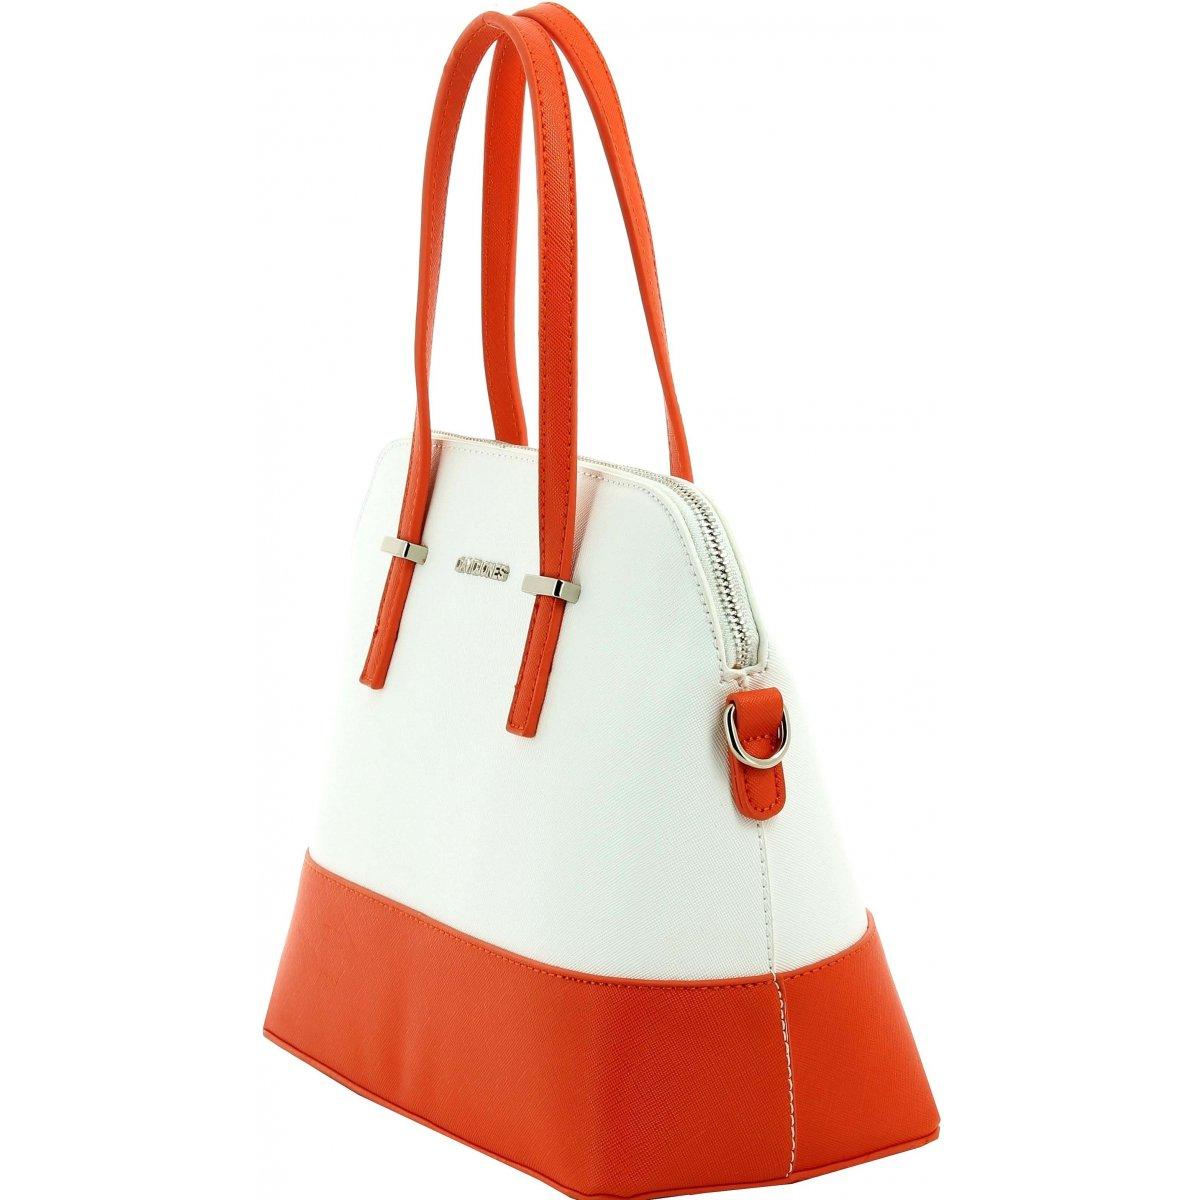 sac main david jones dj50771 couleur principale white orange. Black Bedroom Furniture Sets. Home Design Ideas